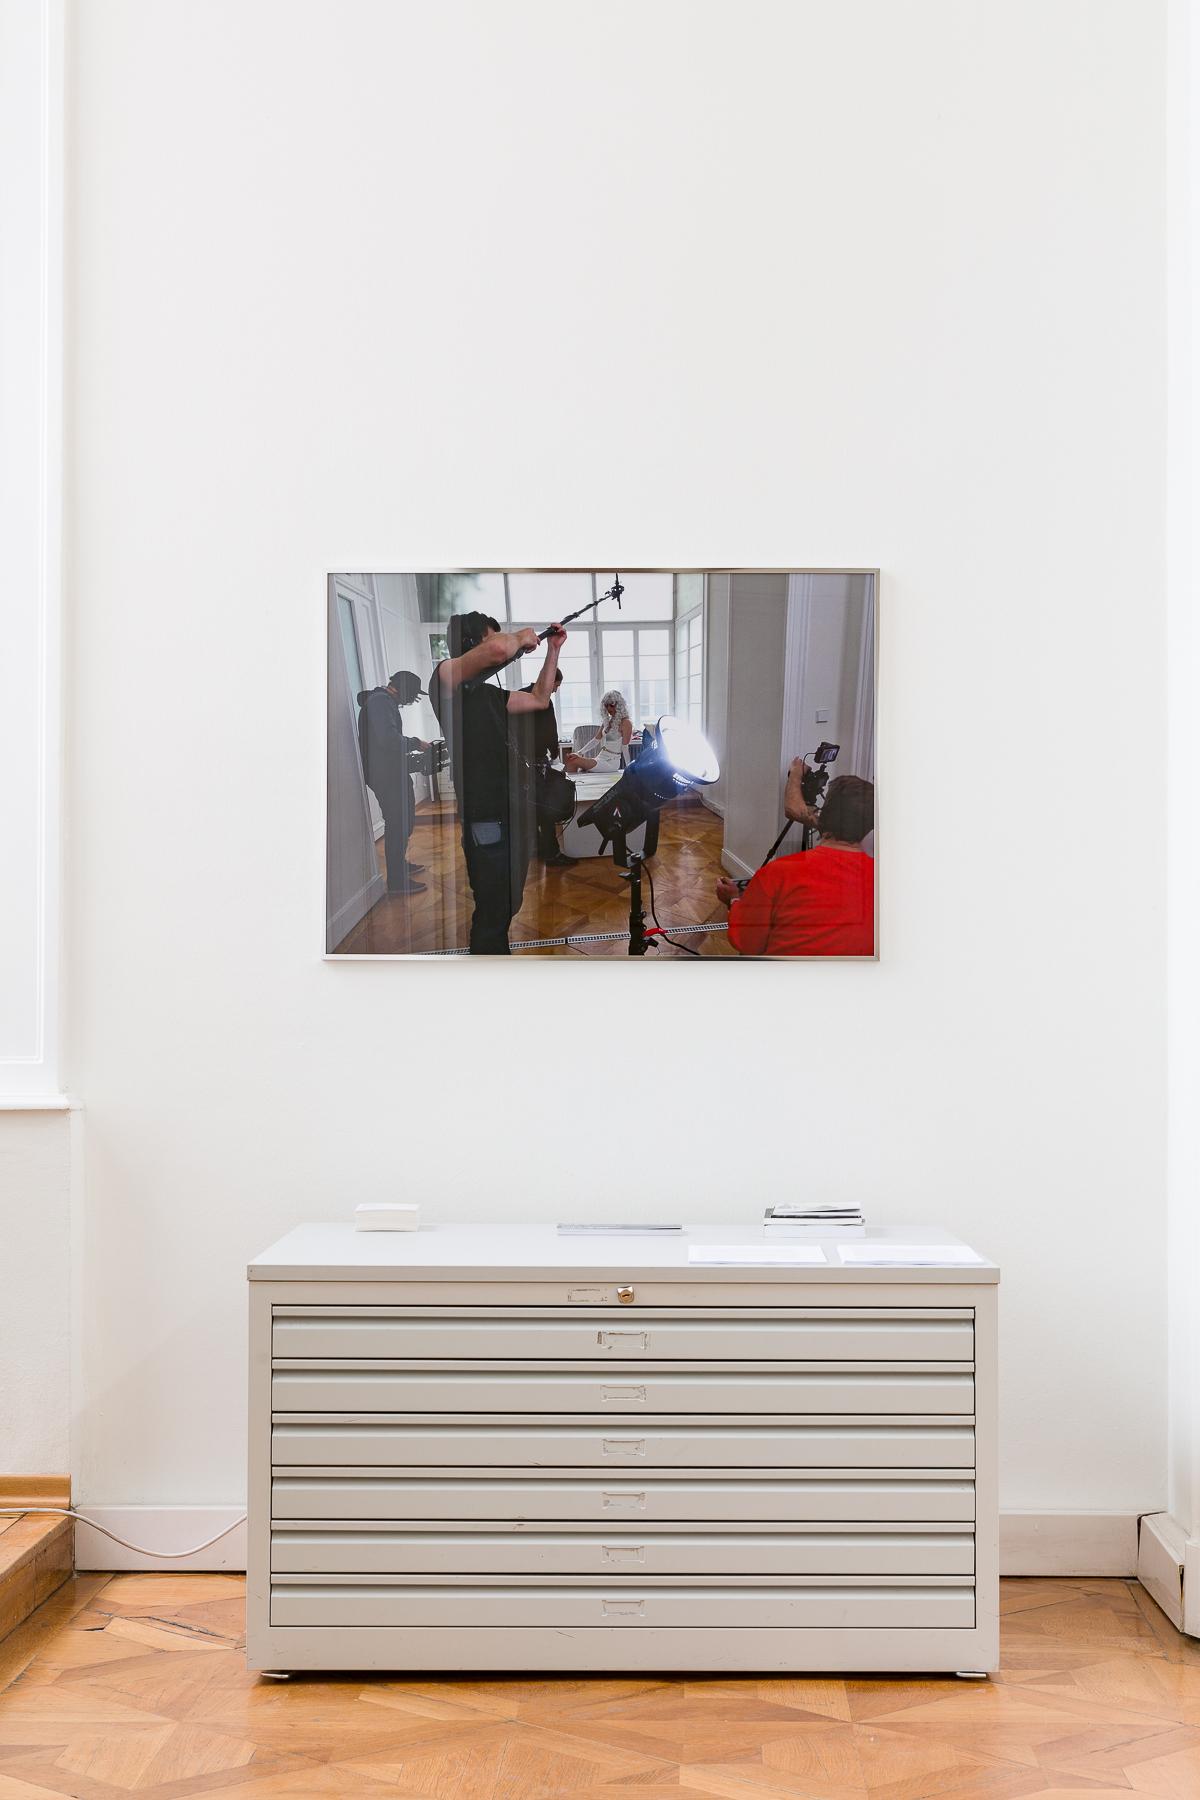 2019_05_20_Elke-Krystufek_Croy-Nielsen_by-kunst-dokumentation-com_037_web.jpg